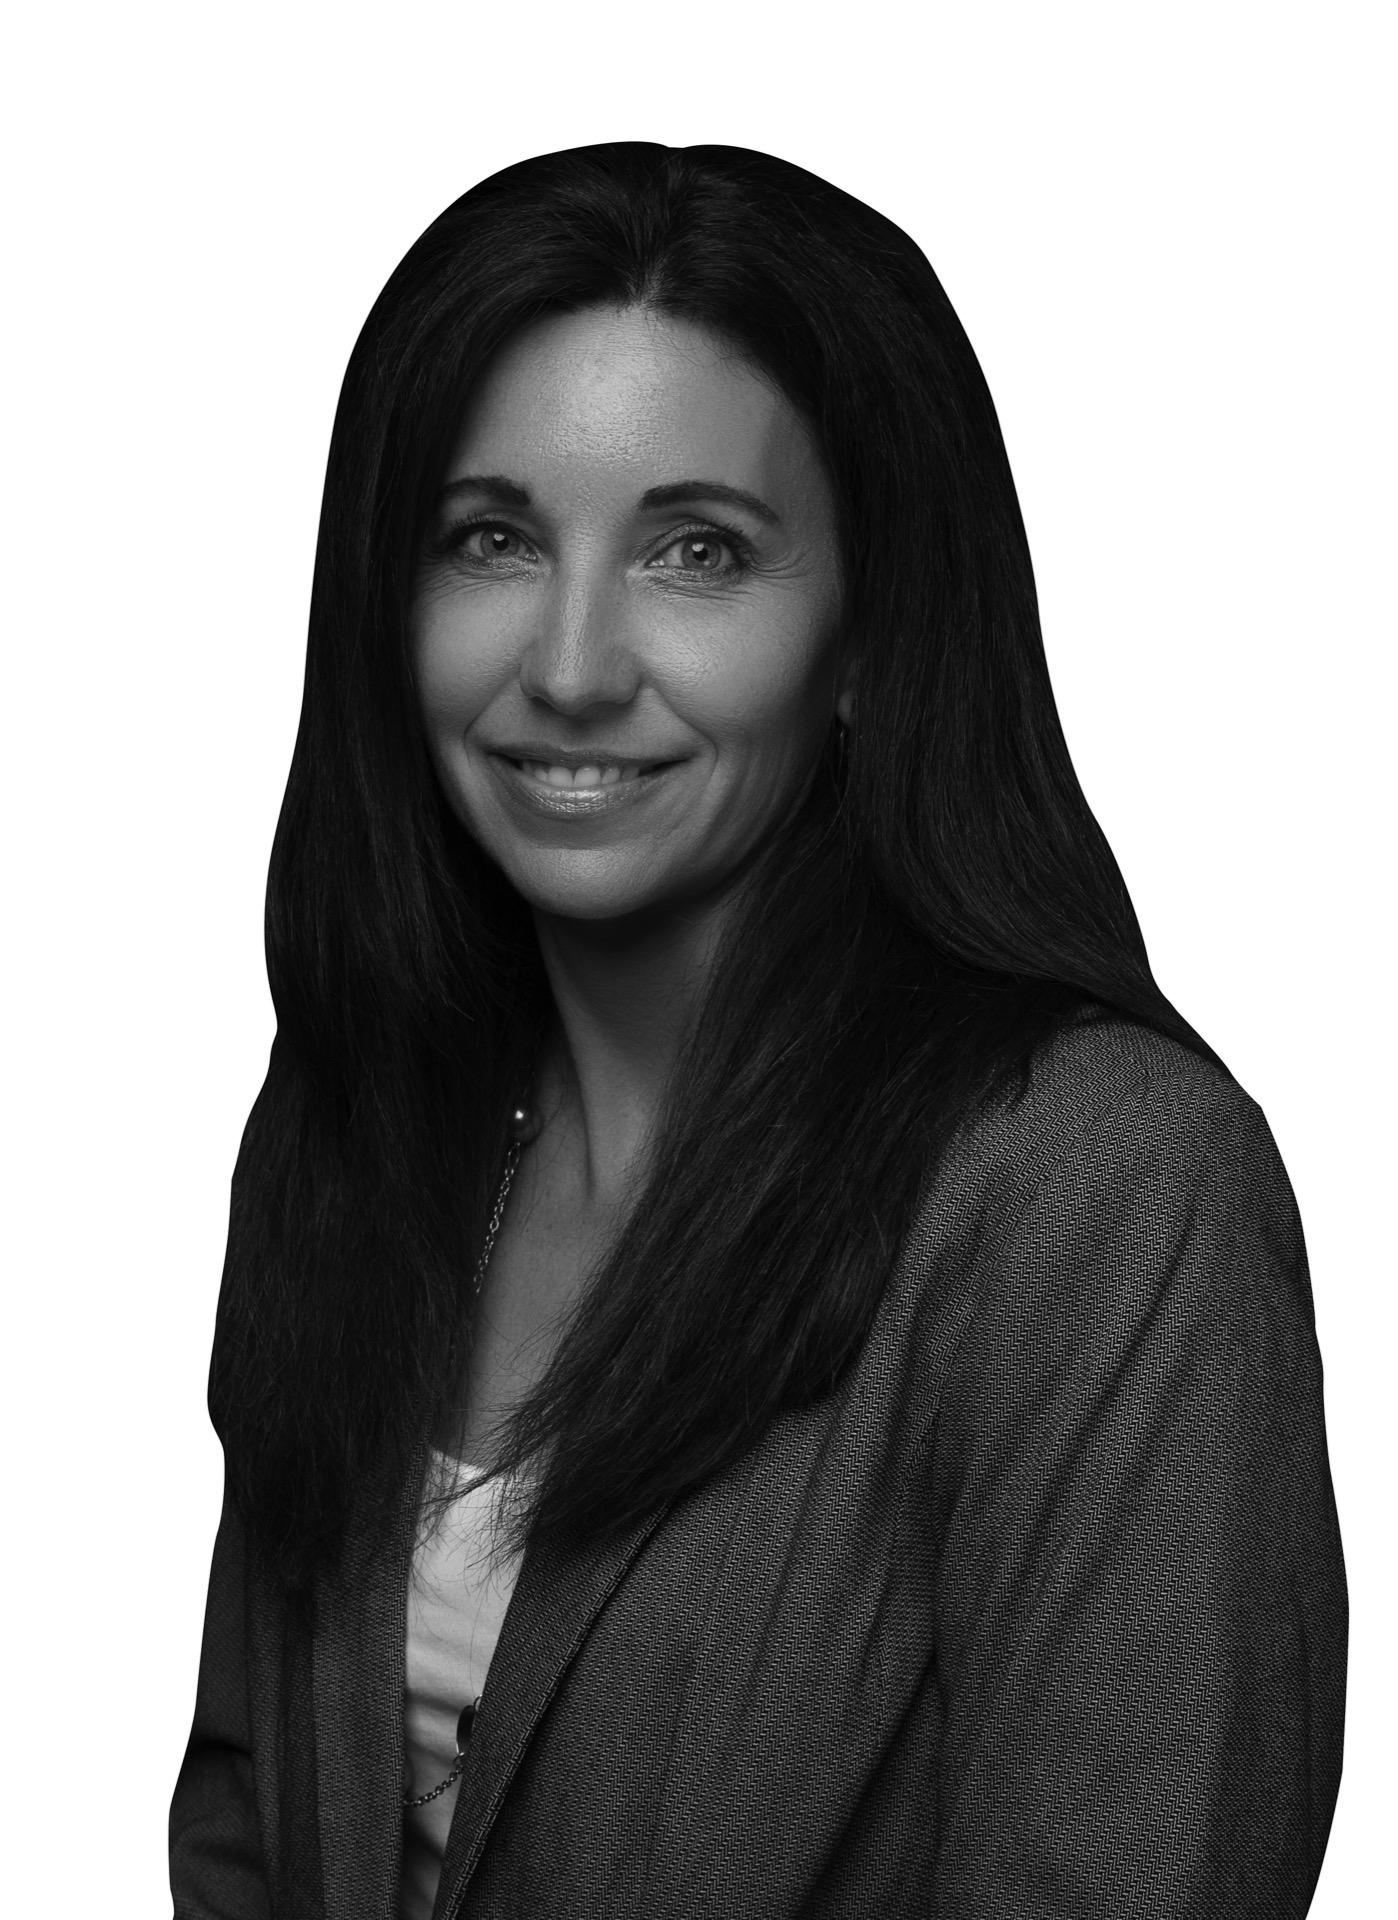 Susan Scenna